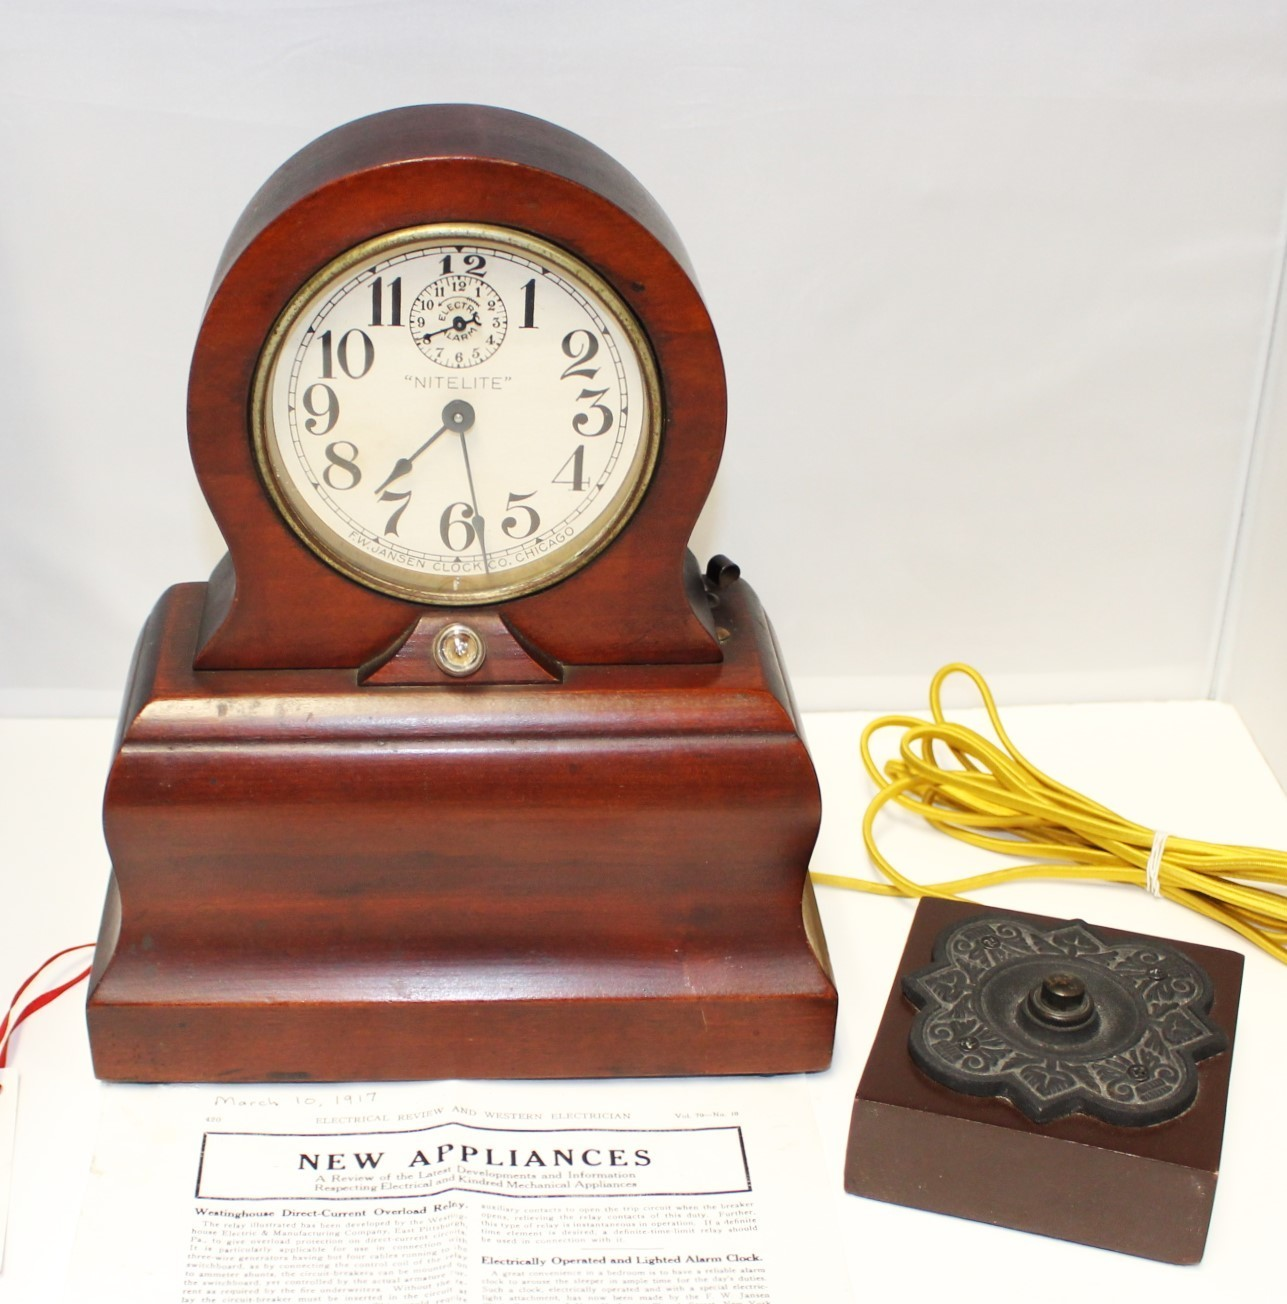 1910 American F.W. Jansen Nitelite Mahogany Wood Alarm Clock w/ Light